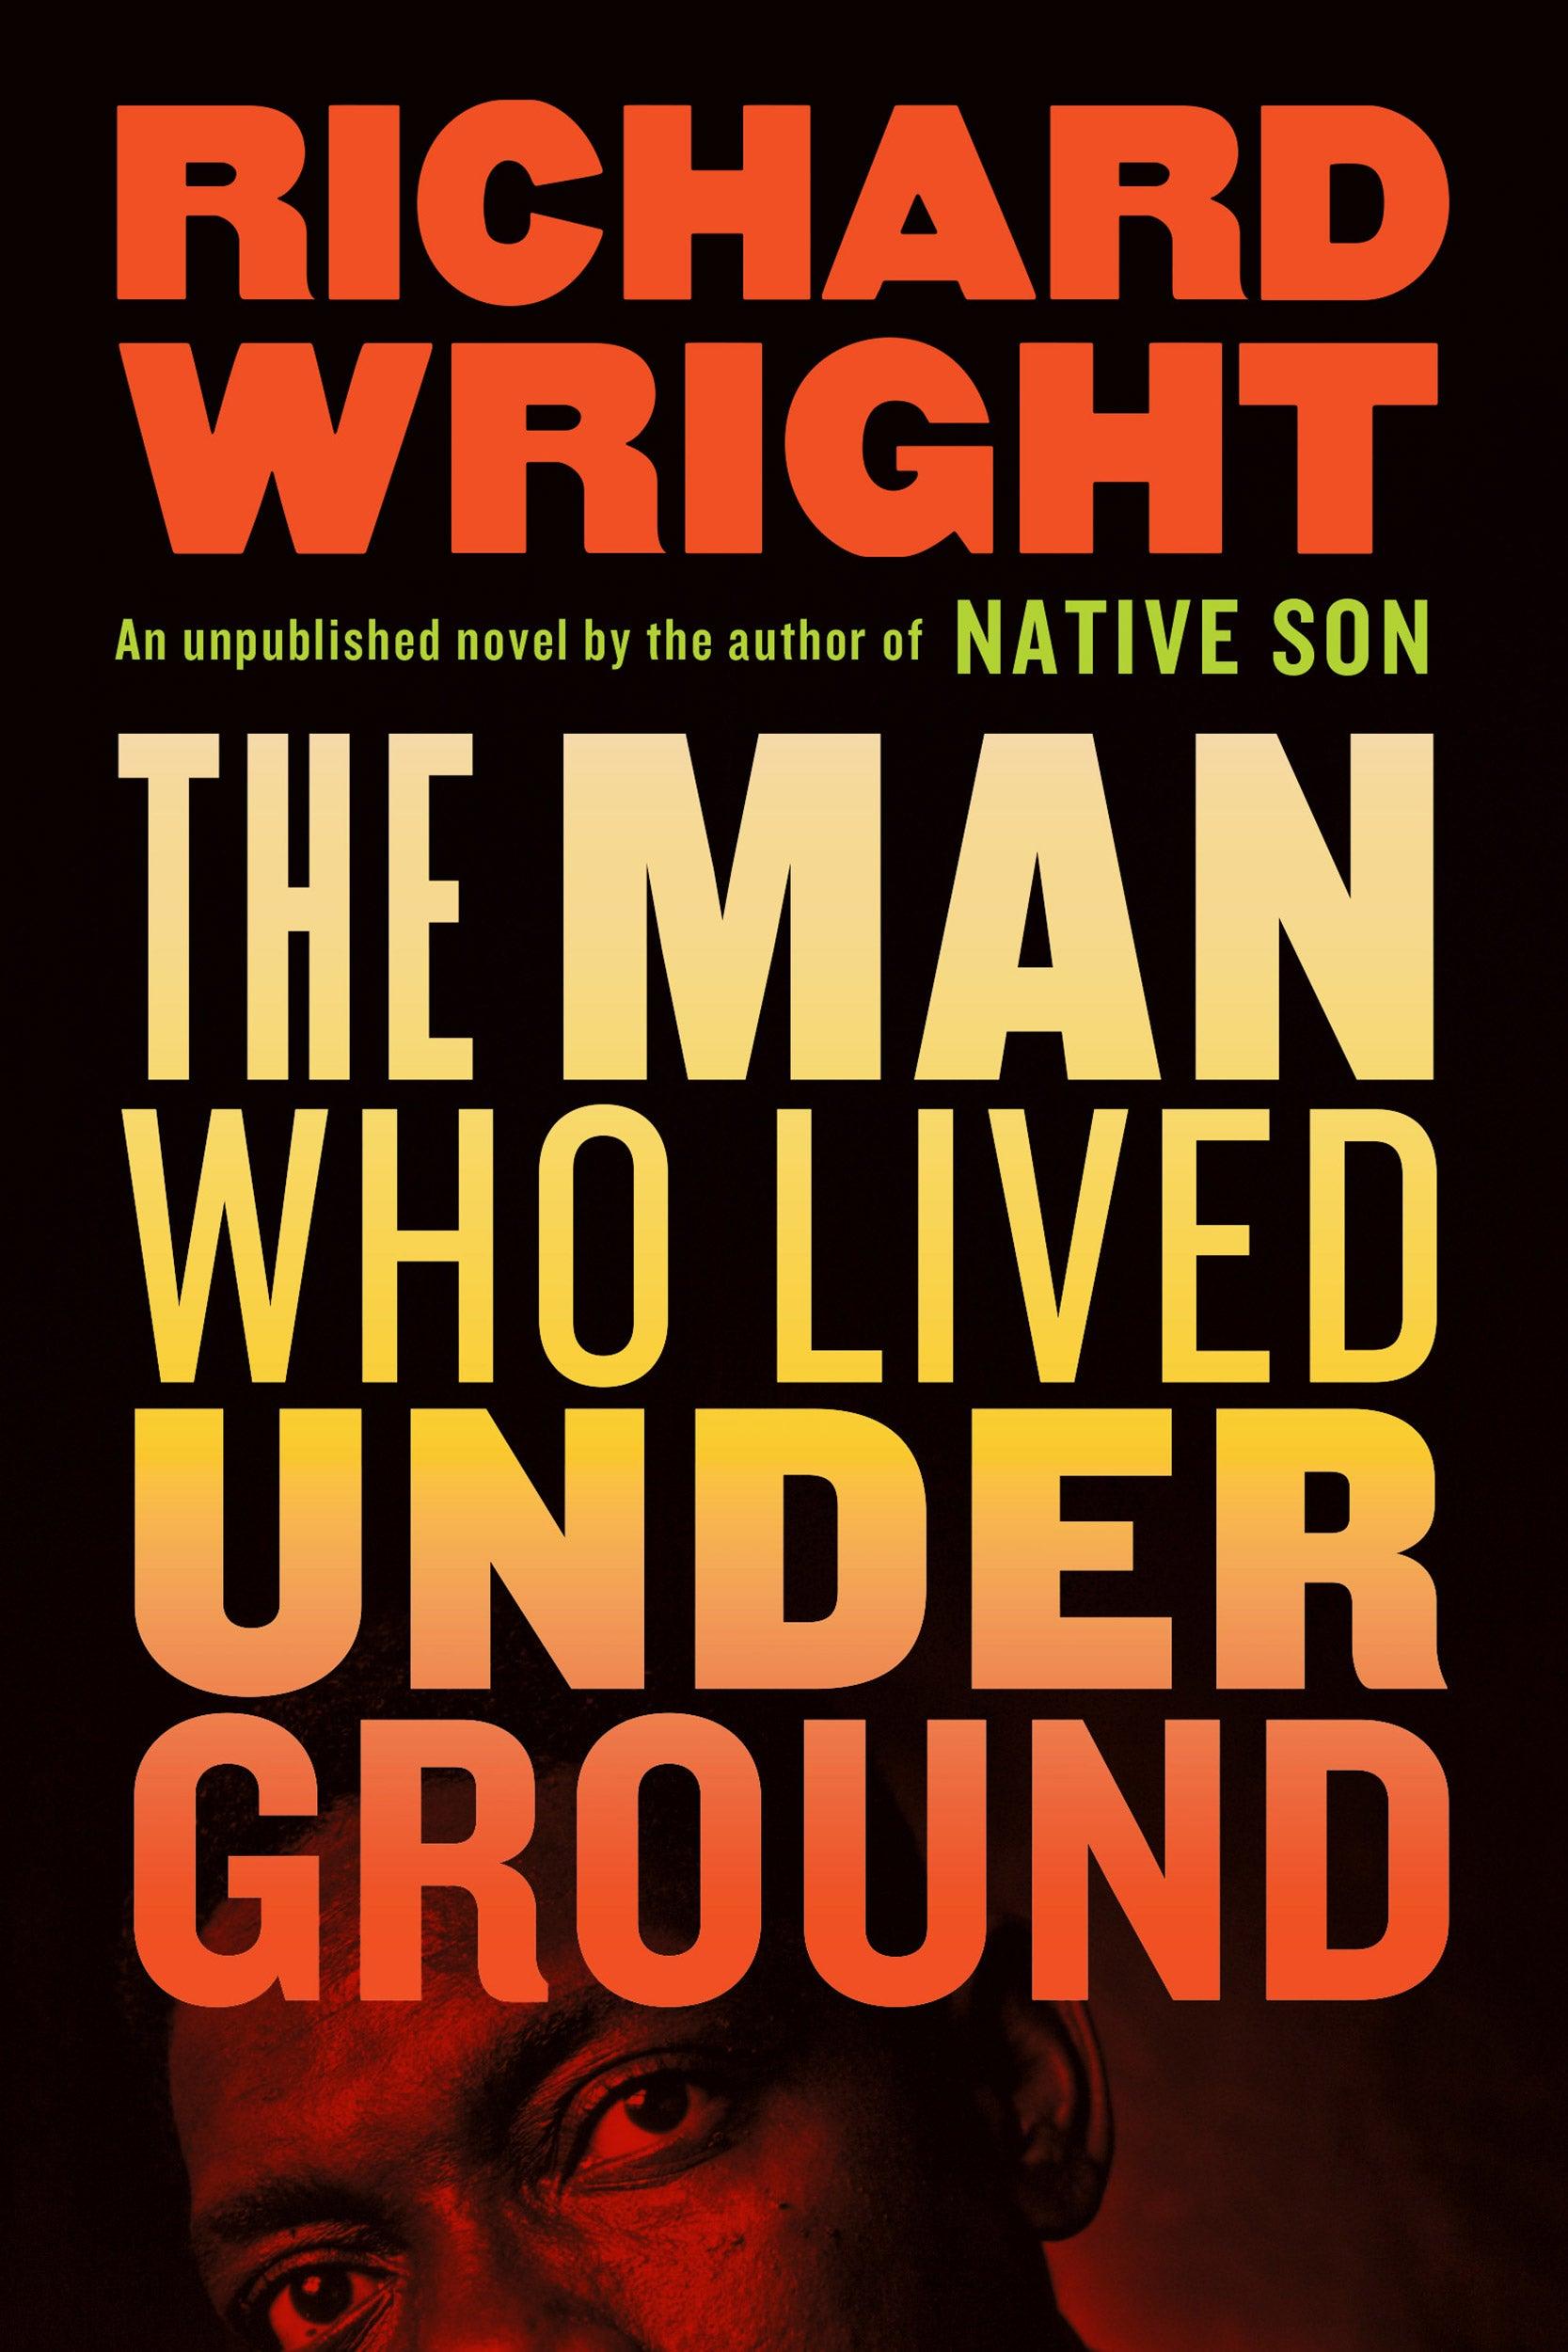 Richard Wright book.